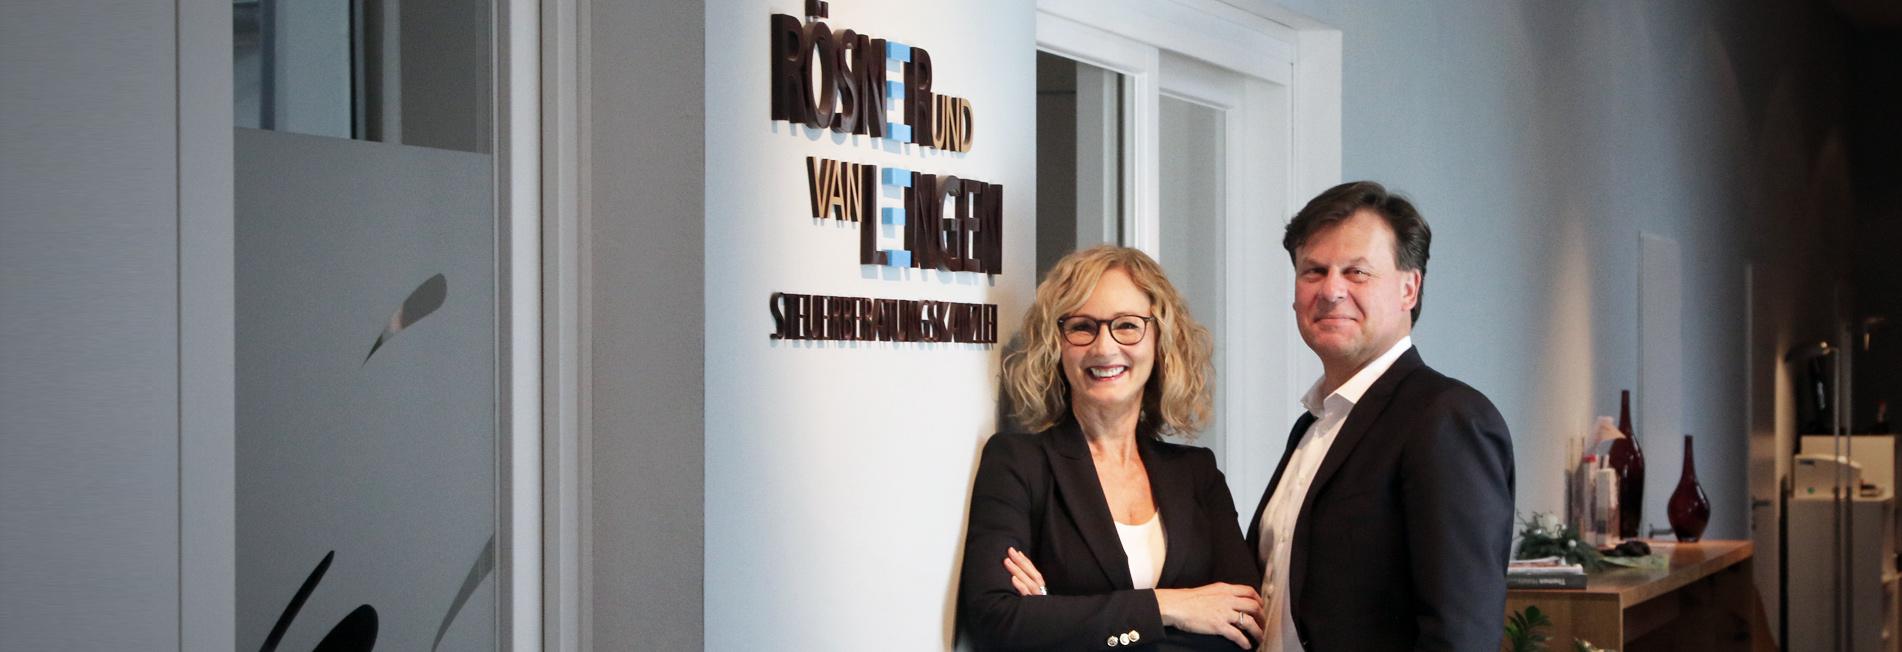 Rösner & van Lengen vor ihrem Logo